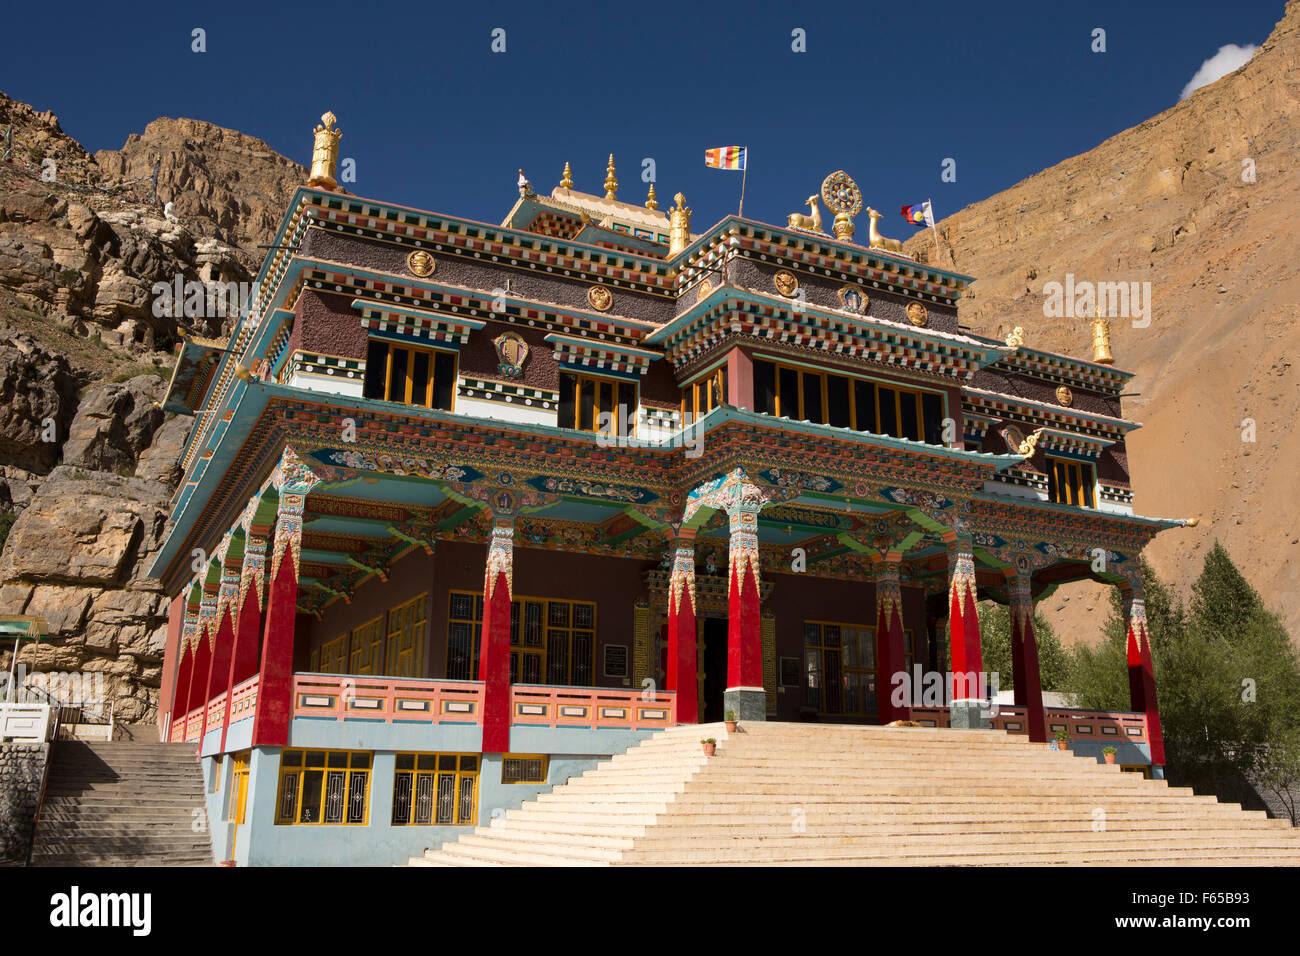 India, Himachal Pradesh, Spiti, Kaza, Sakya Tangyud (Tenggyu) Monastery inaugurated in 2009 by Dalai Lama - Stock Image